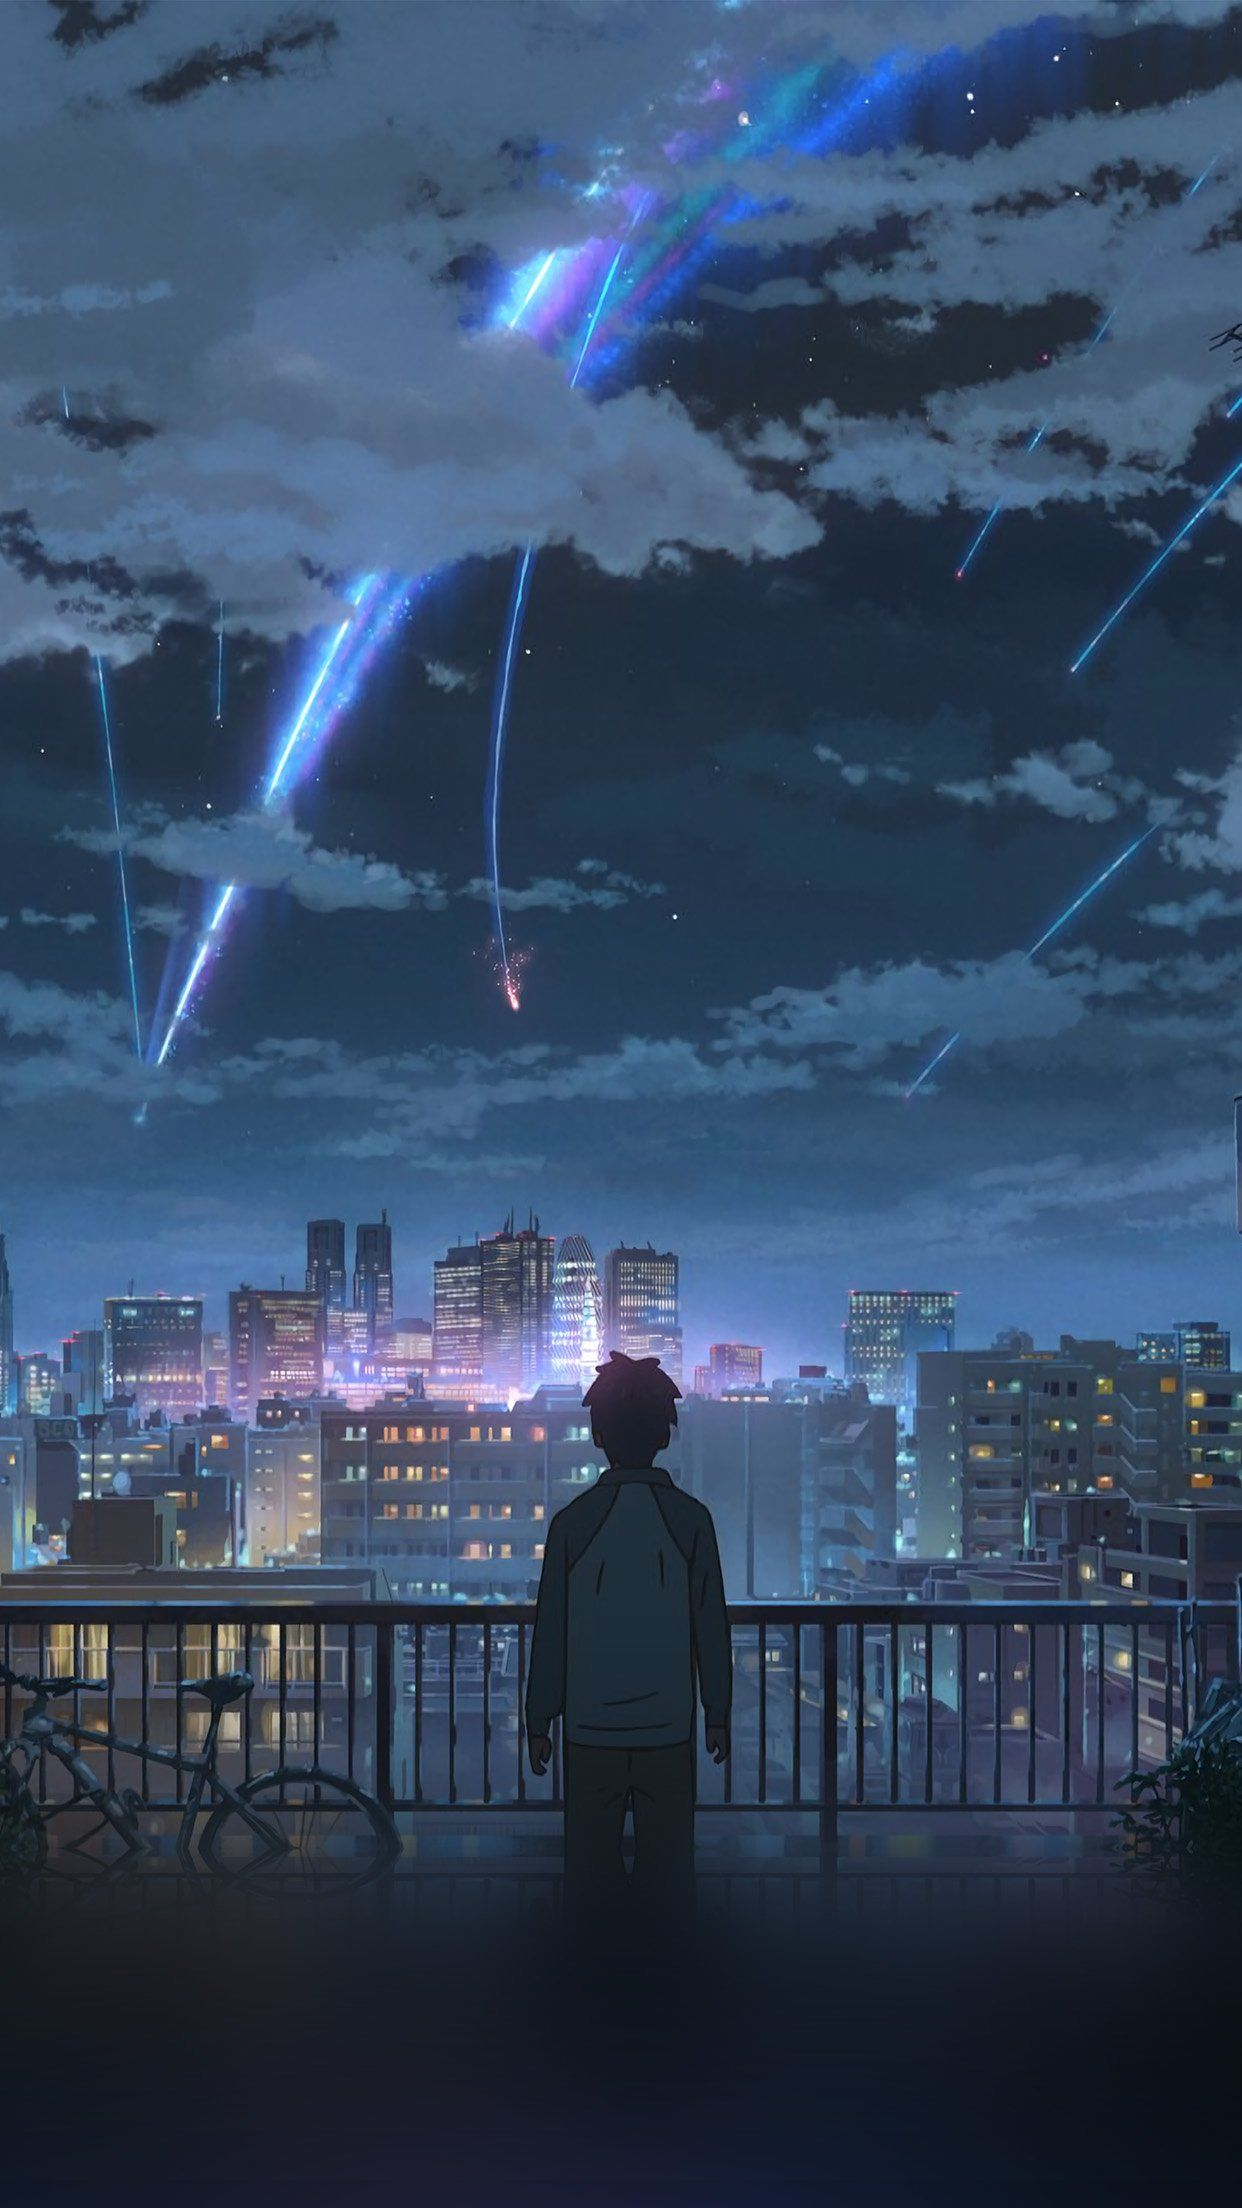 Wallpaper Anime Full Hd Android Wallpaper Nice In 2020 Anime Wallpaper Iphone Hd Anime Wallpapers Anime Wallpaper Download